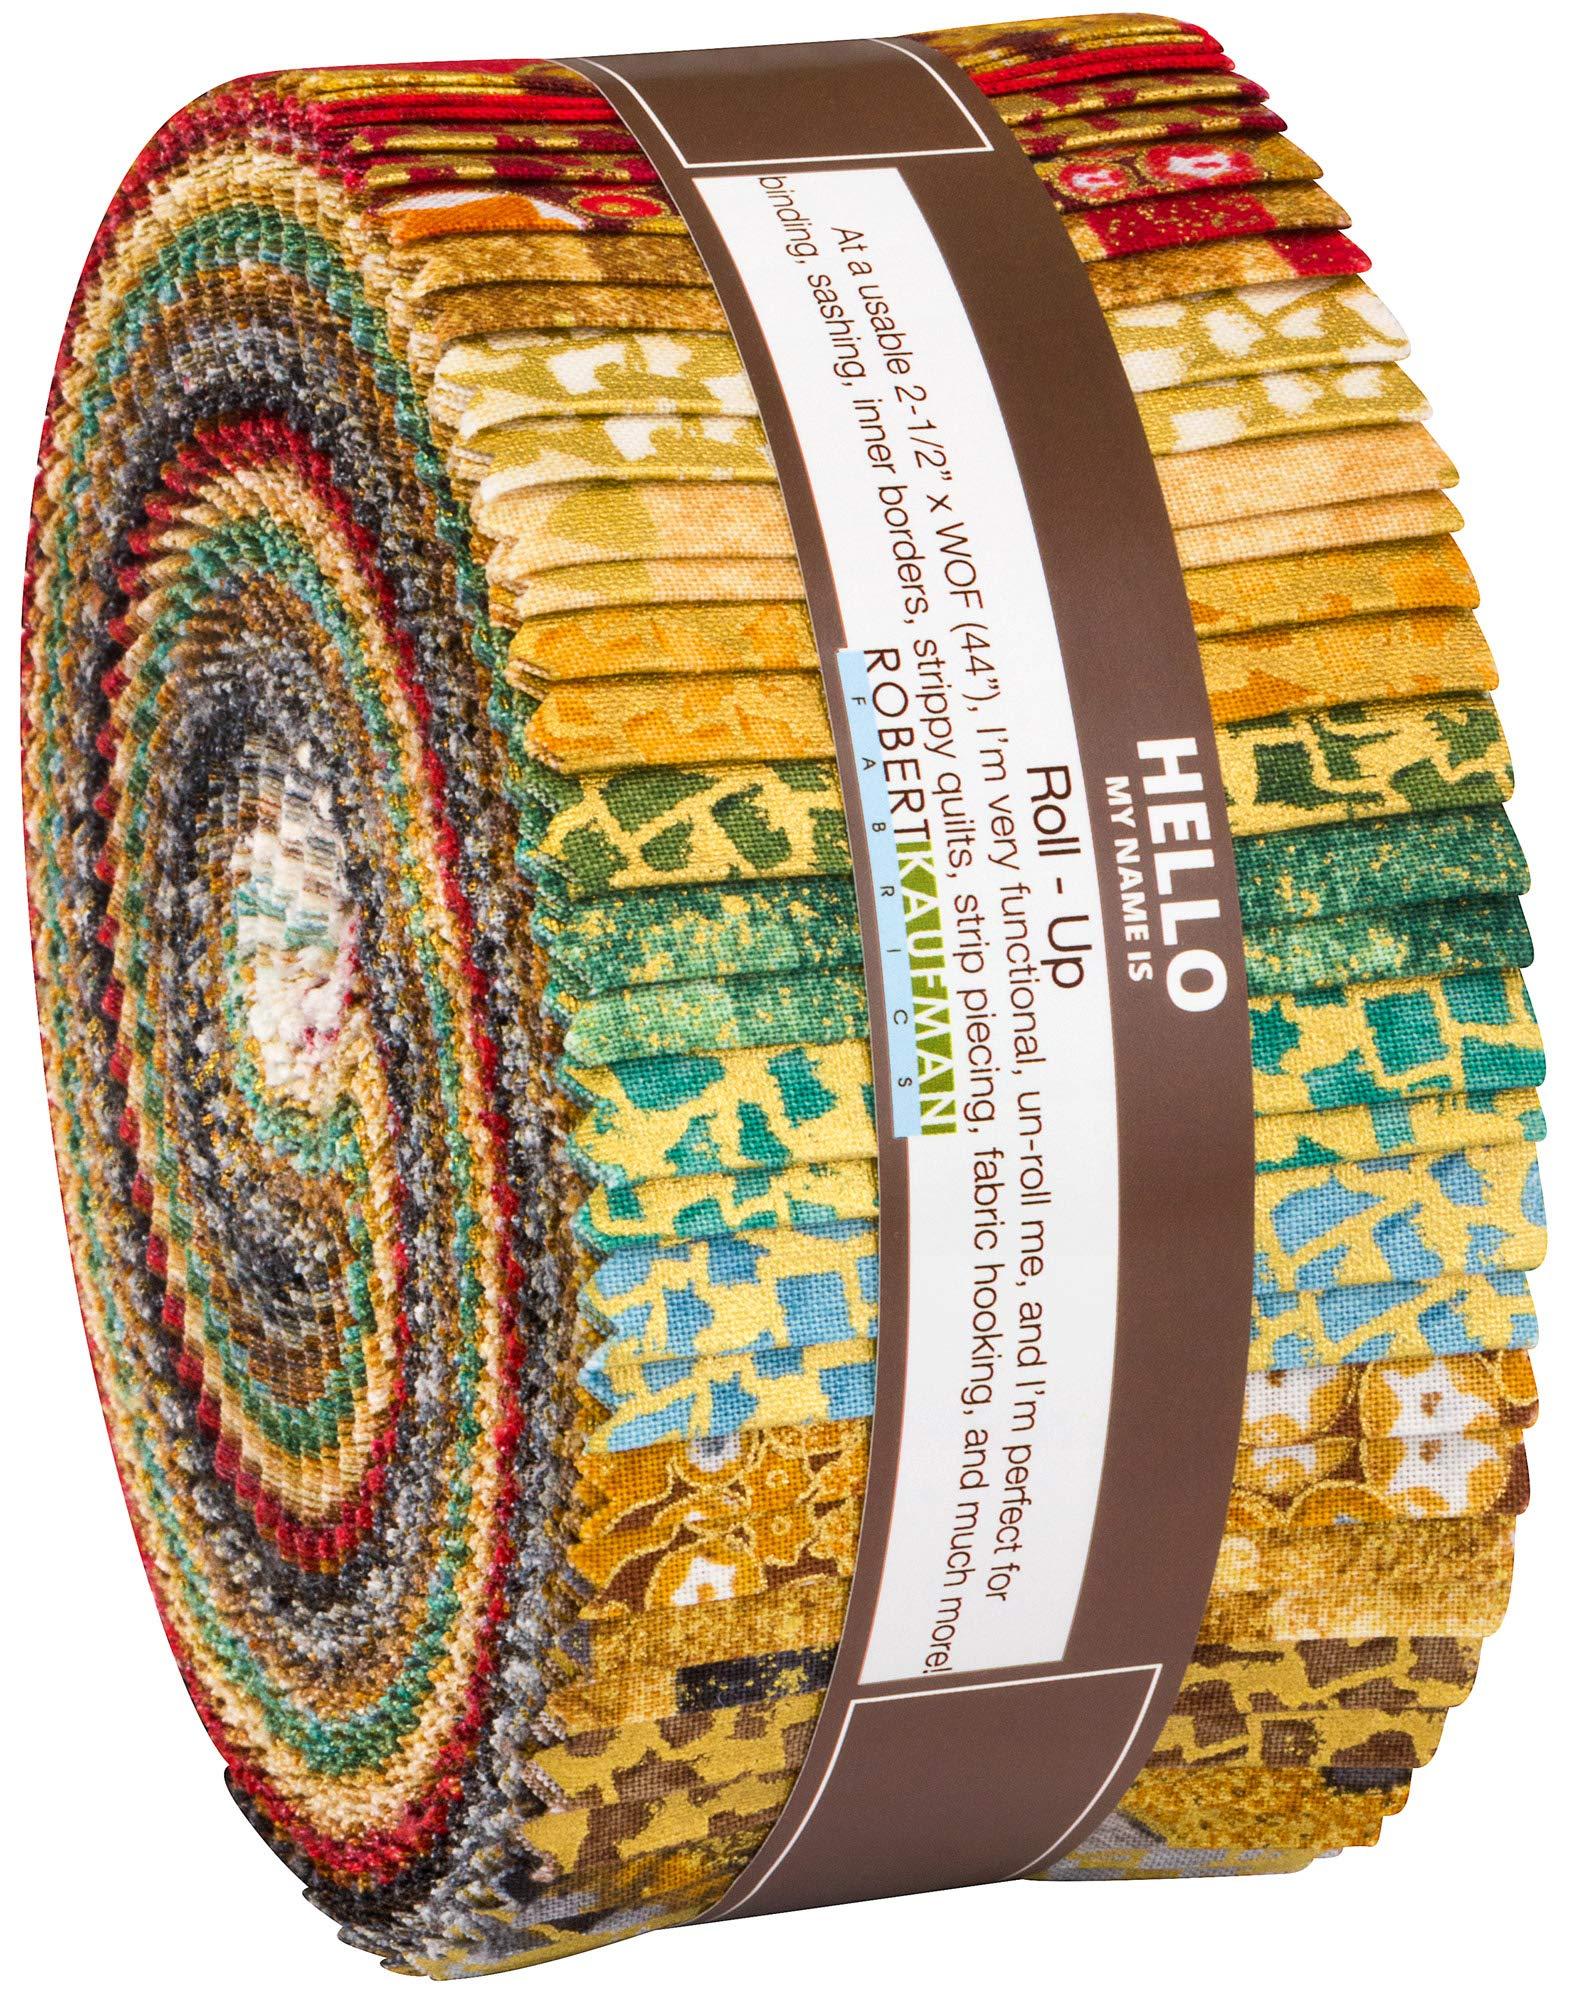 Gustav Klimt Roll Up 40 2.5-inch Strips Jelly Roll by Studio RK Robert Kaufman by Robert Kaufman